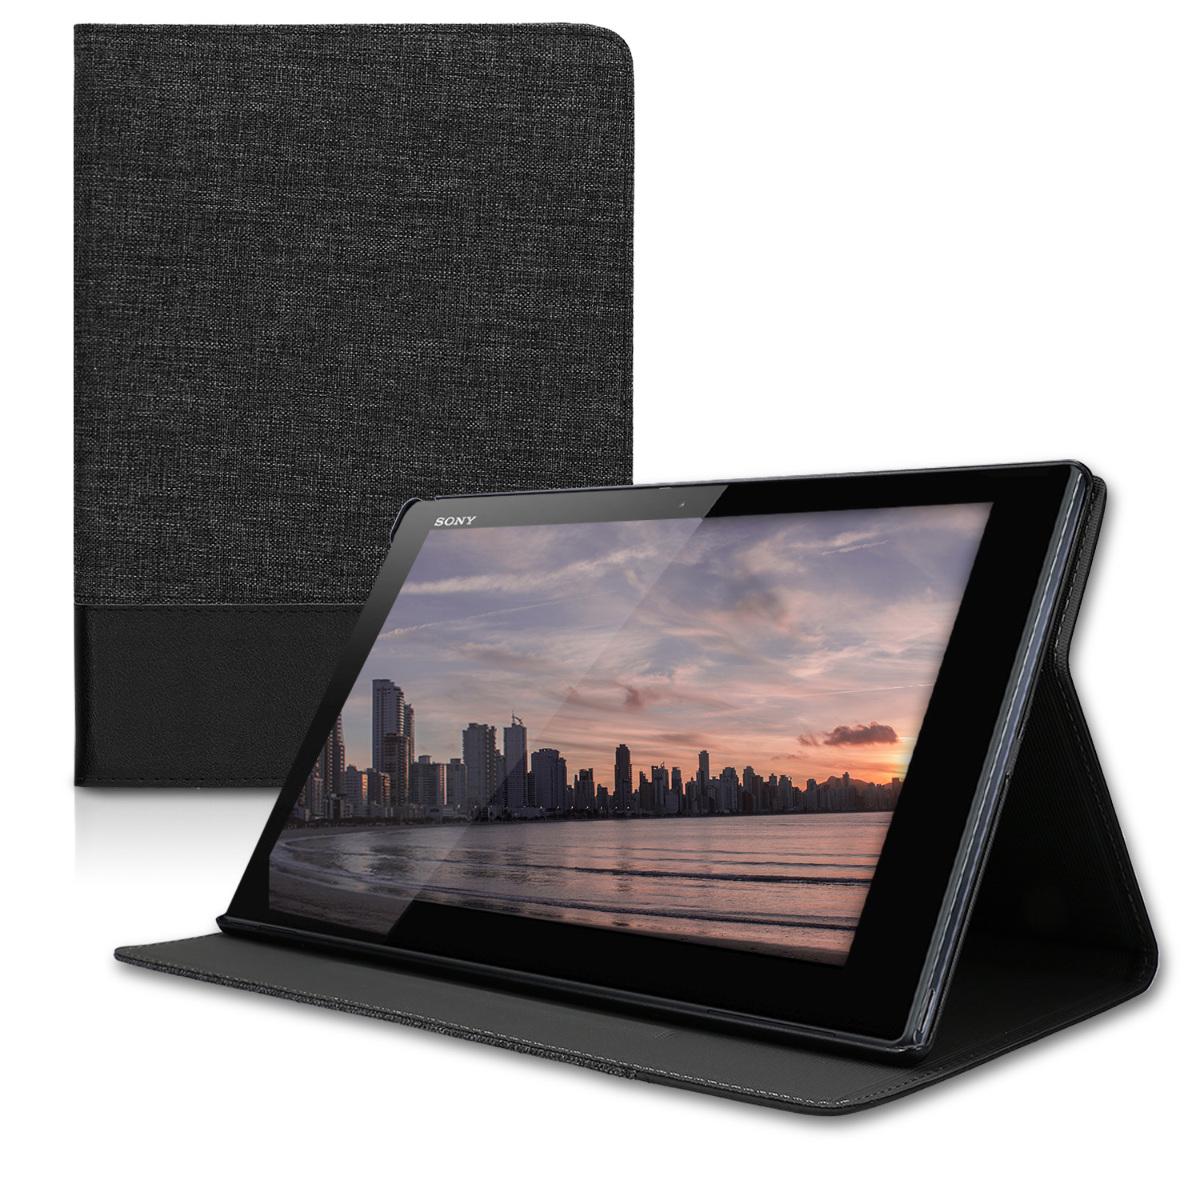 KW Θήκη Πορτοφόλι Sony Xperia Tablet Z4 - Συνθετικό Δέρμα - Anthracite / Black (40056.01)